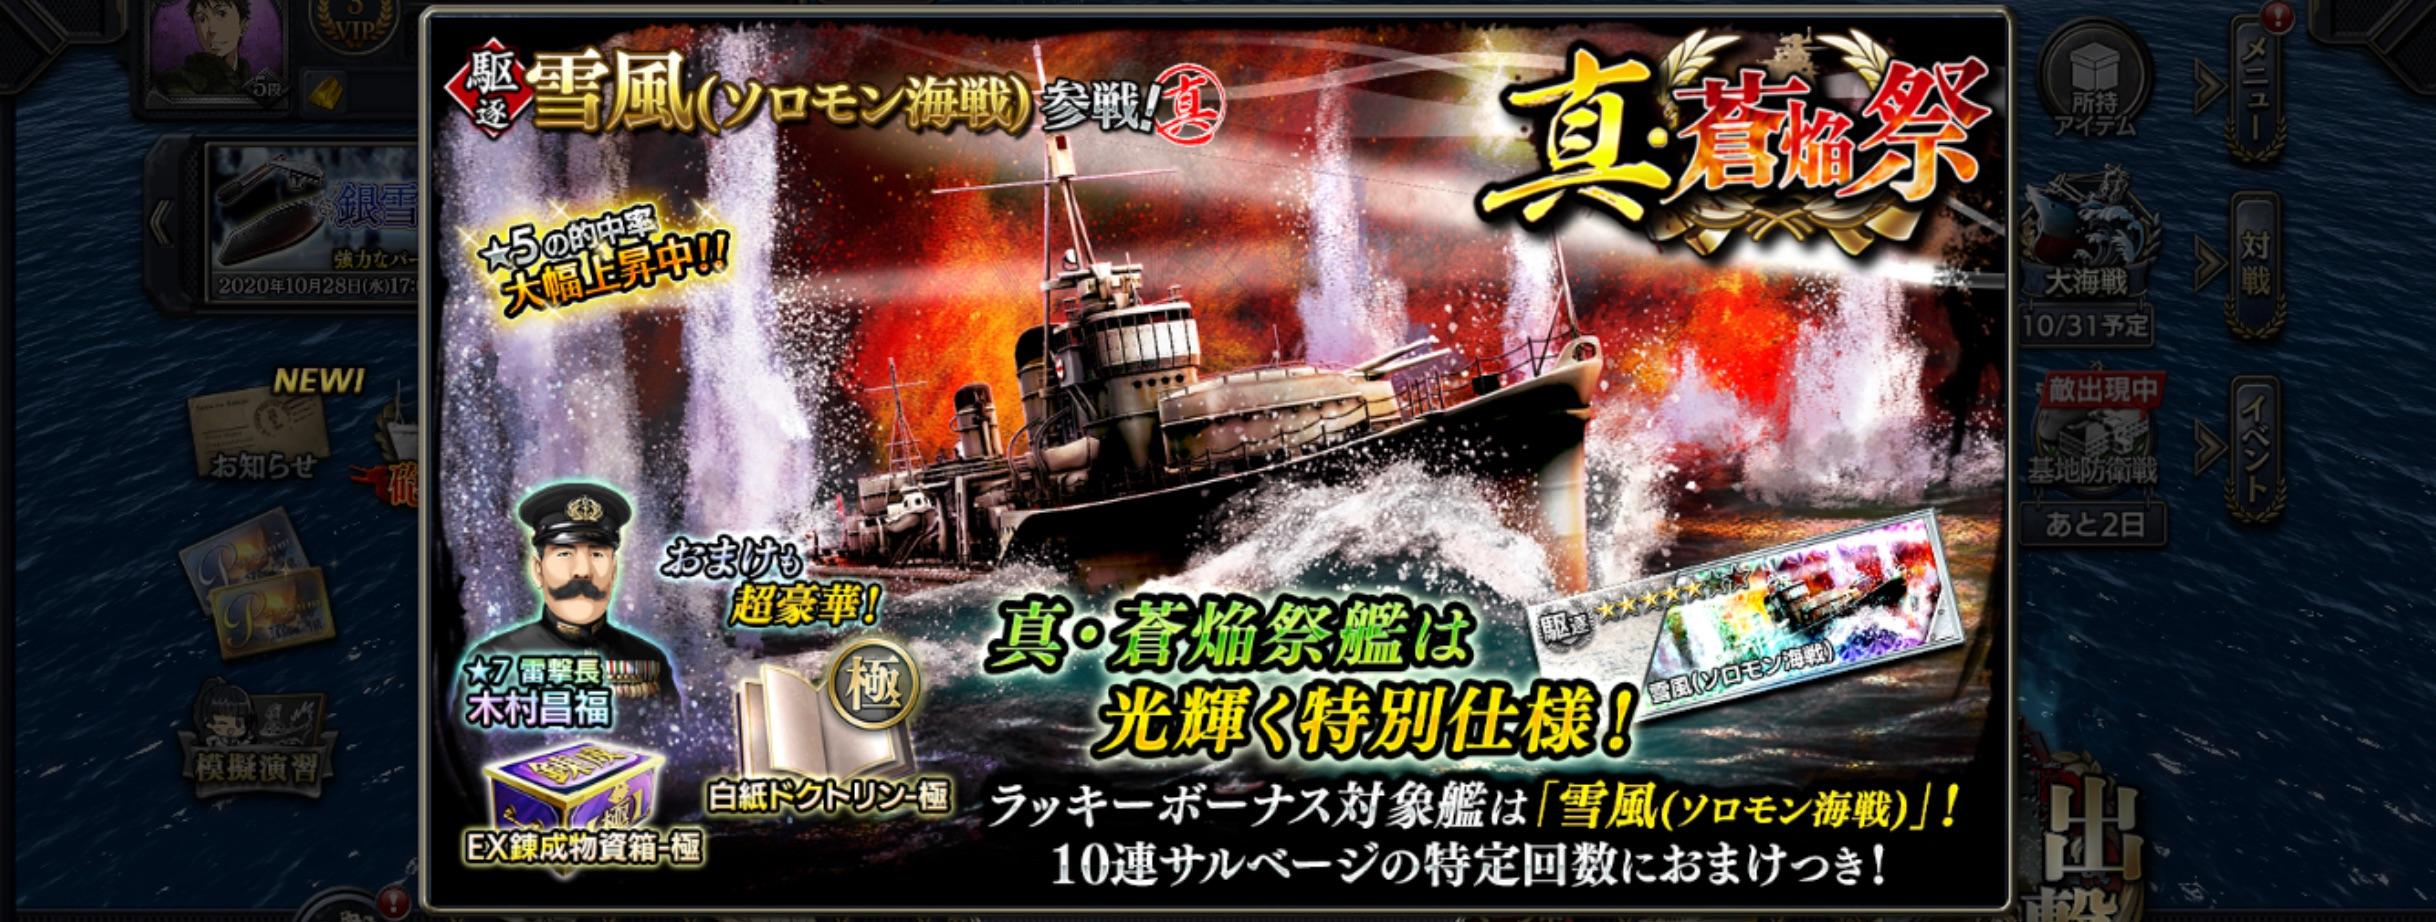 YukikazeS-salvage